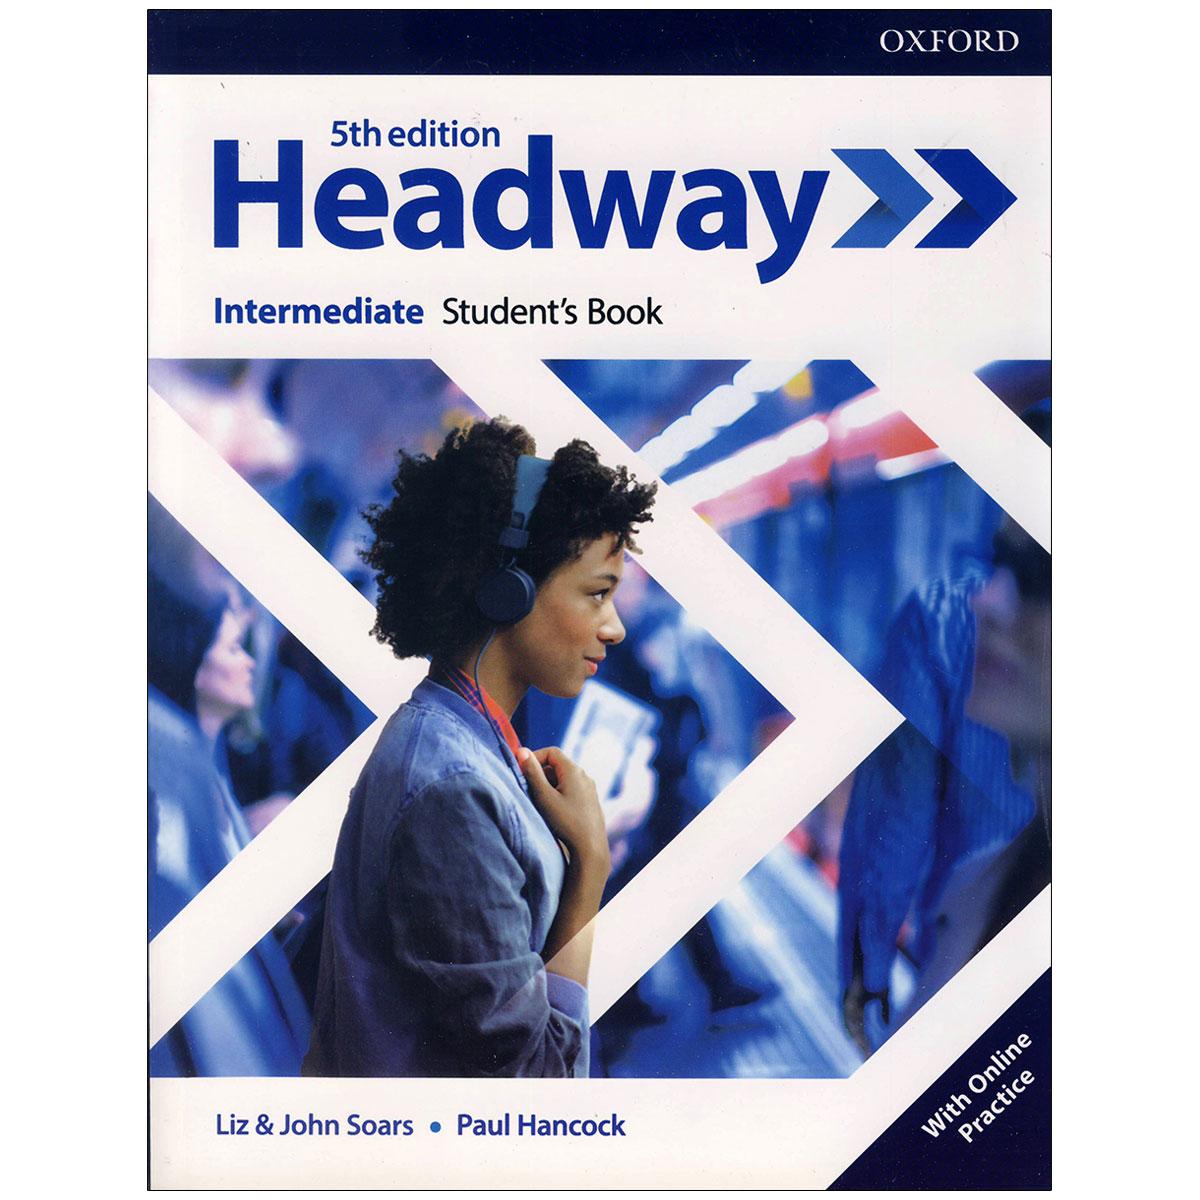 کتاب  headway intermediate 5th edition اثر john and liz soars and Paul Hancock انتشارات آکسفورد